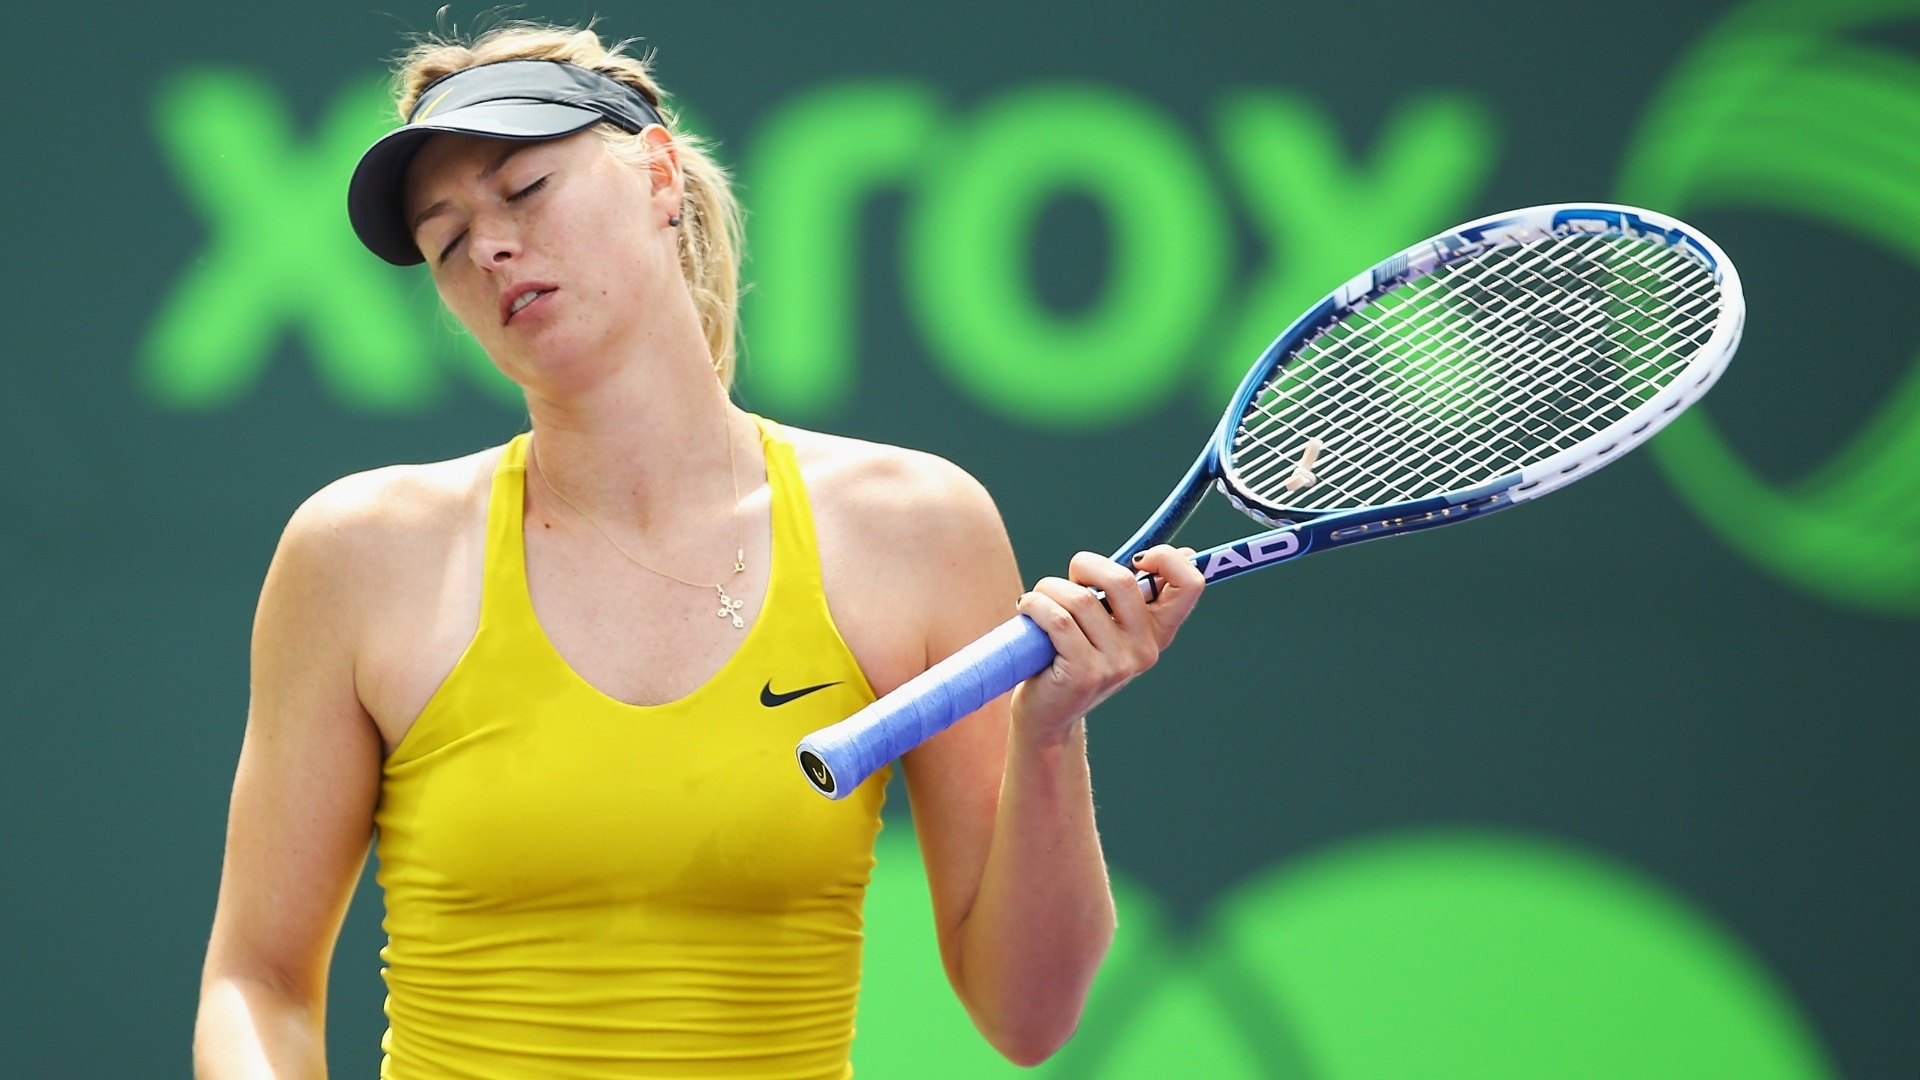 27.mar.2014 - Maria Sharapova se aborrece durante serviço no Premier de Miami